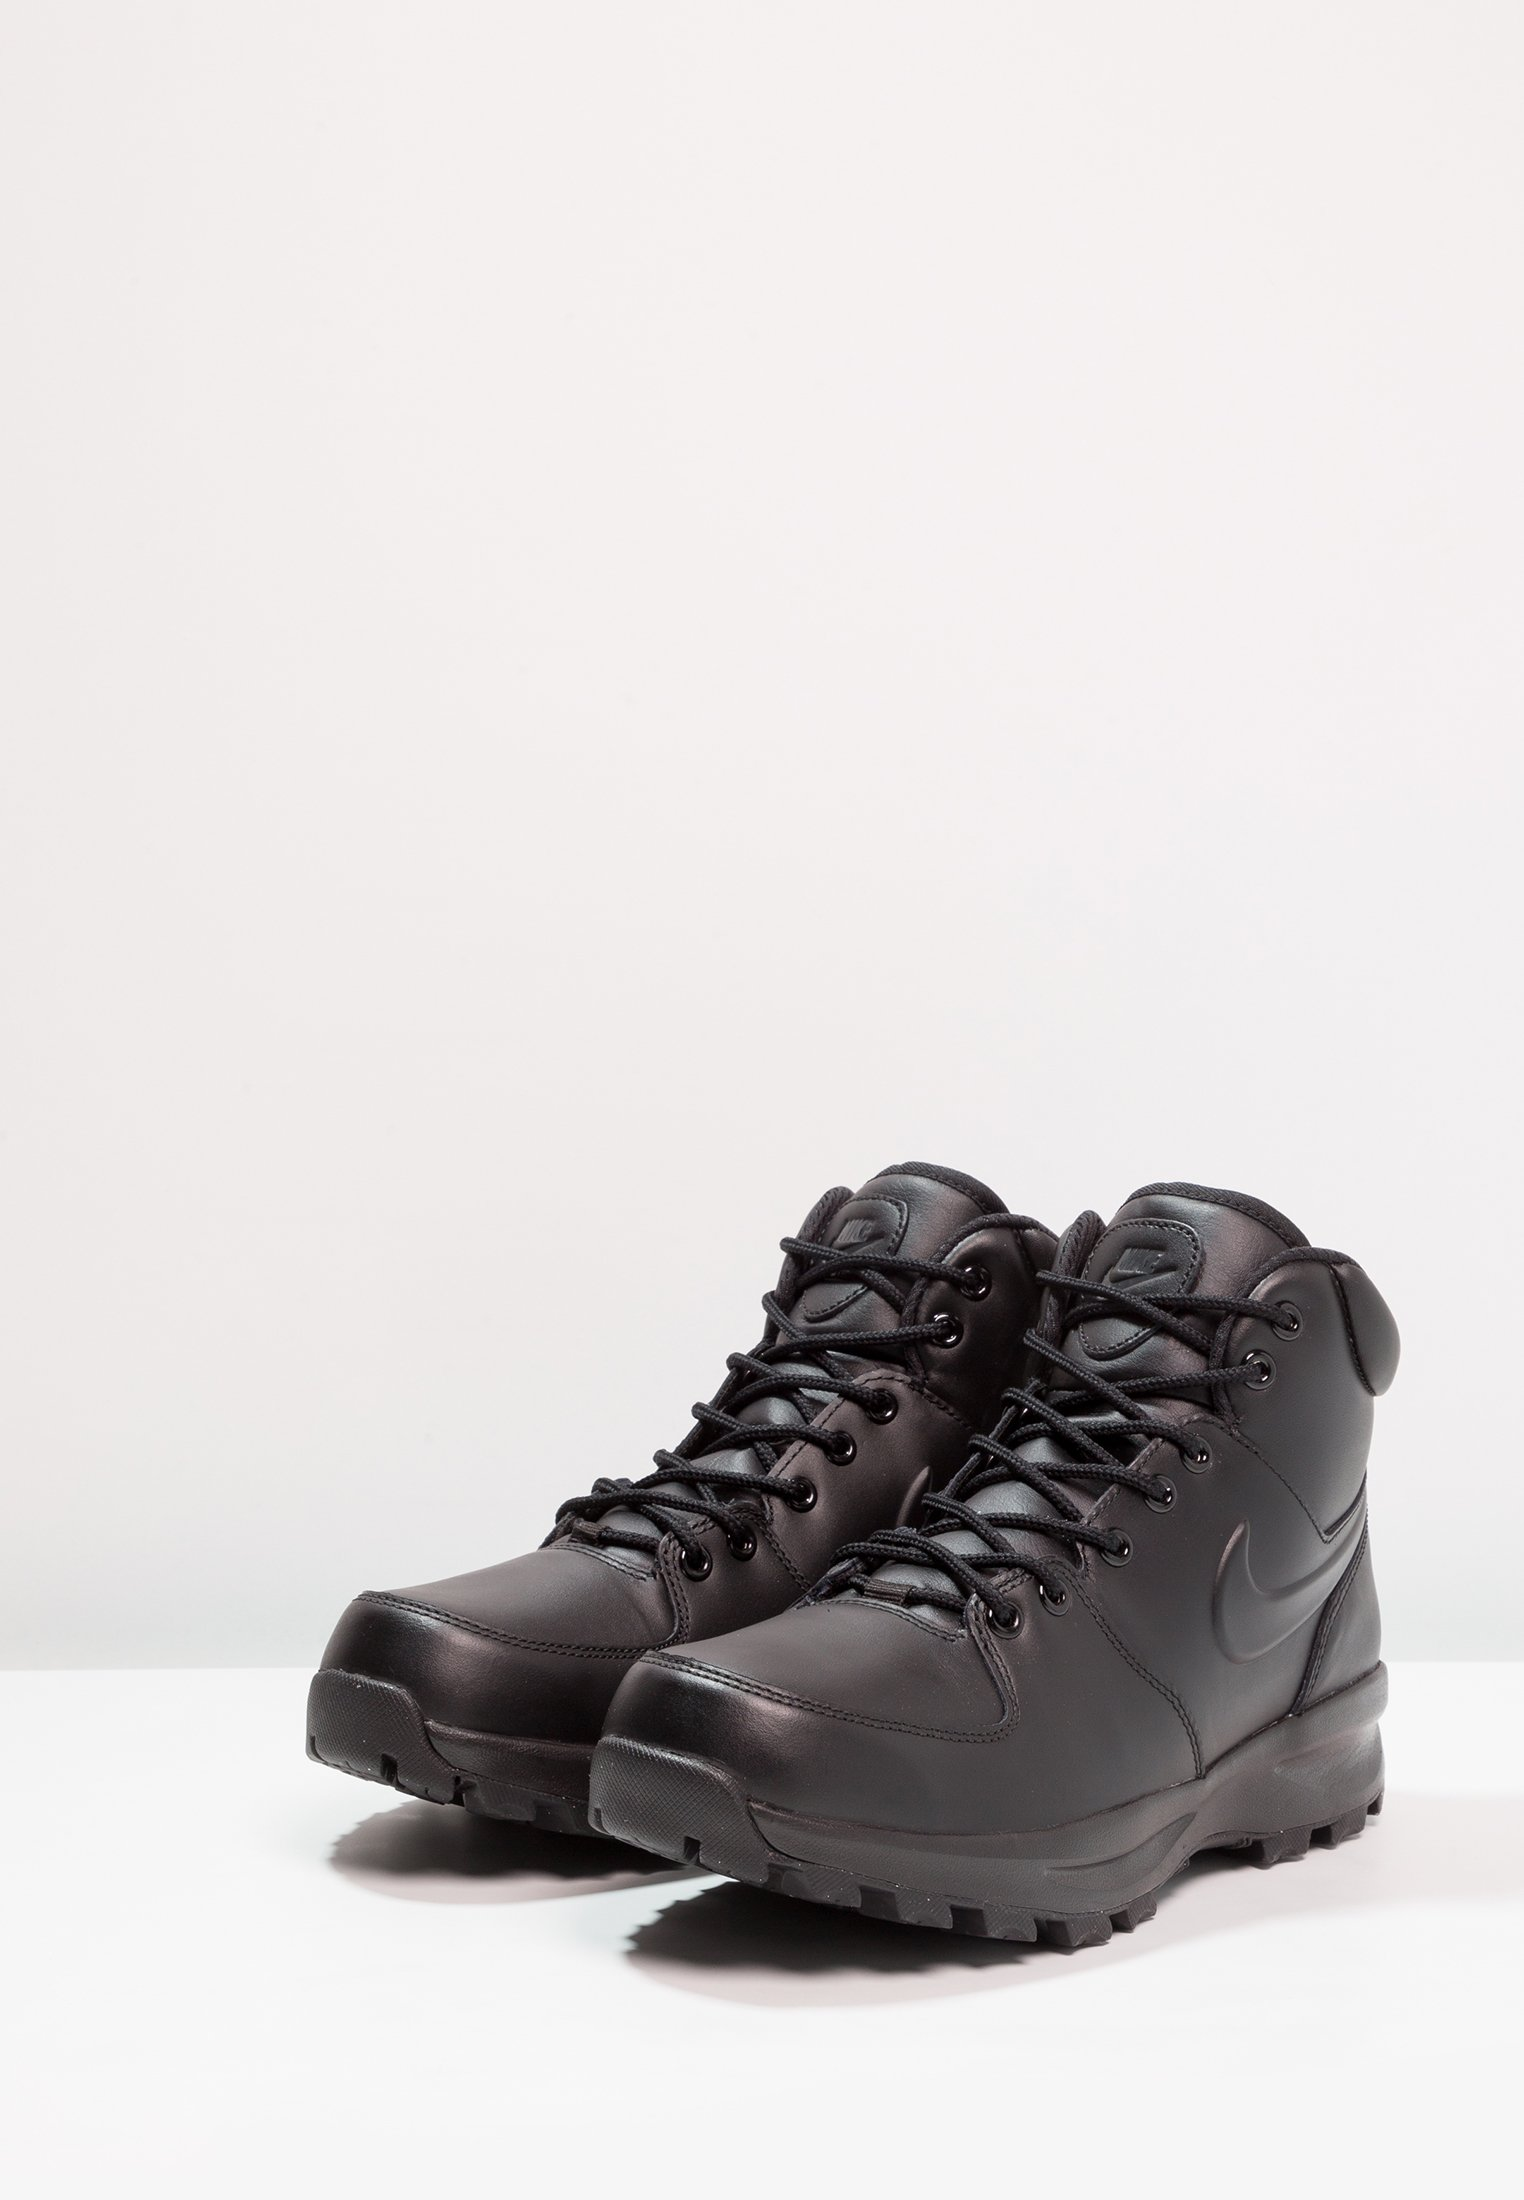 Nike LeatherBaskets Sportswear Manoa Schwarz Montantes LzSUGMqVp